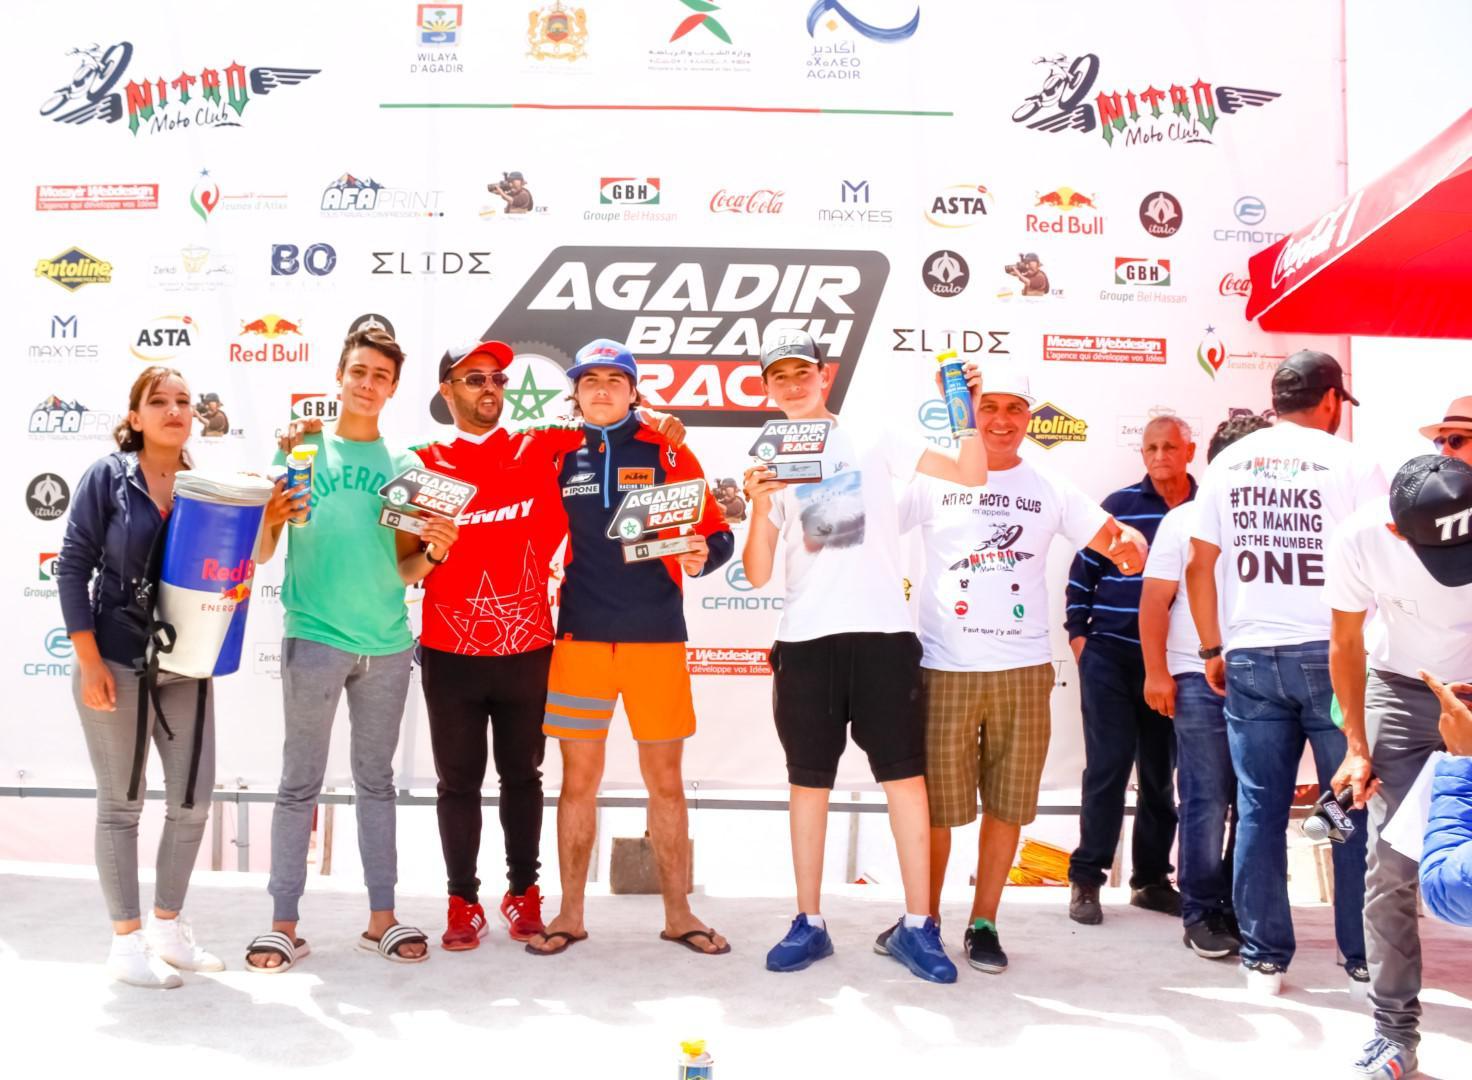 agadir-beach-race-la-reussite-791-9.jpg